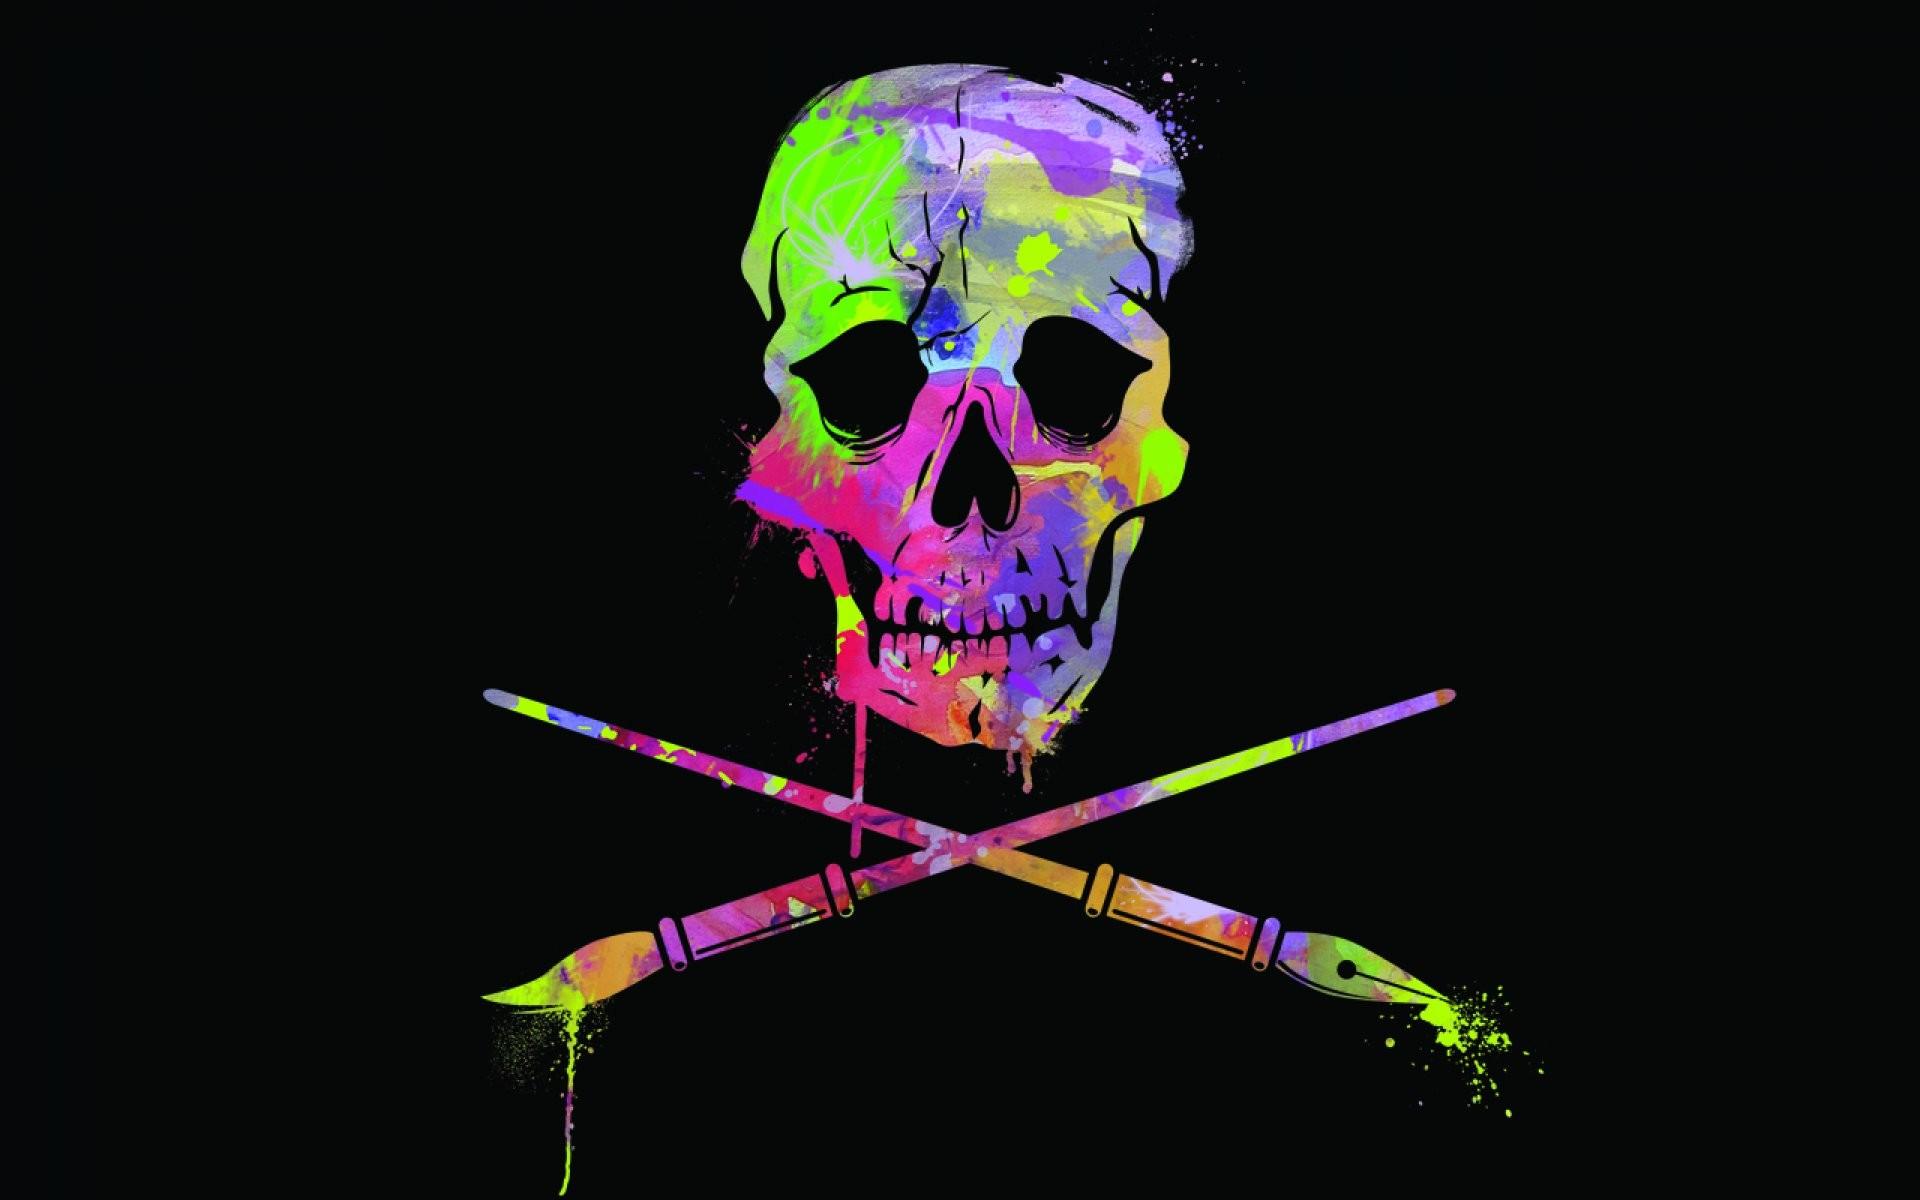 Dark Skull Evil Horror Skulls Art Artwork Skeleton - Wallpaper - HD Wallpaper